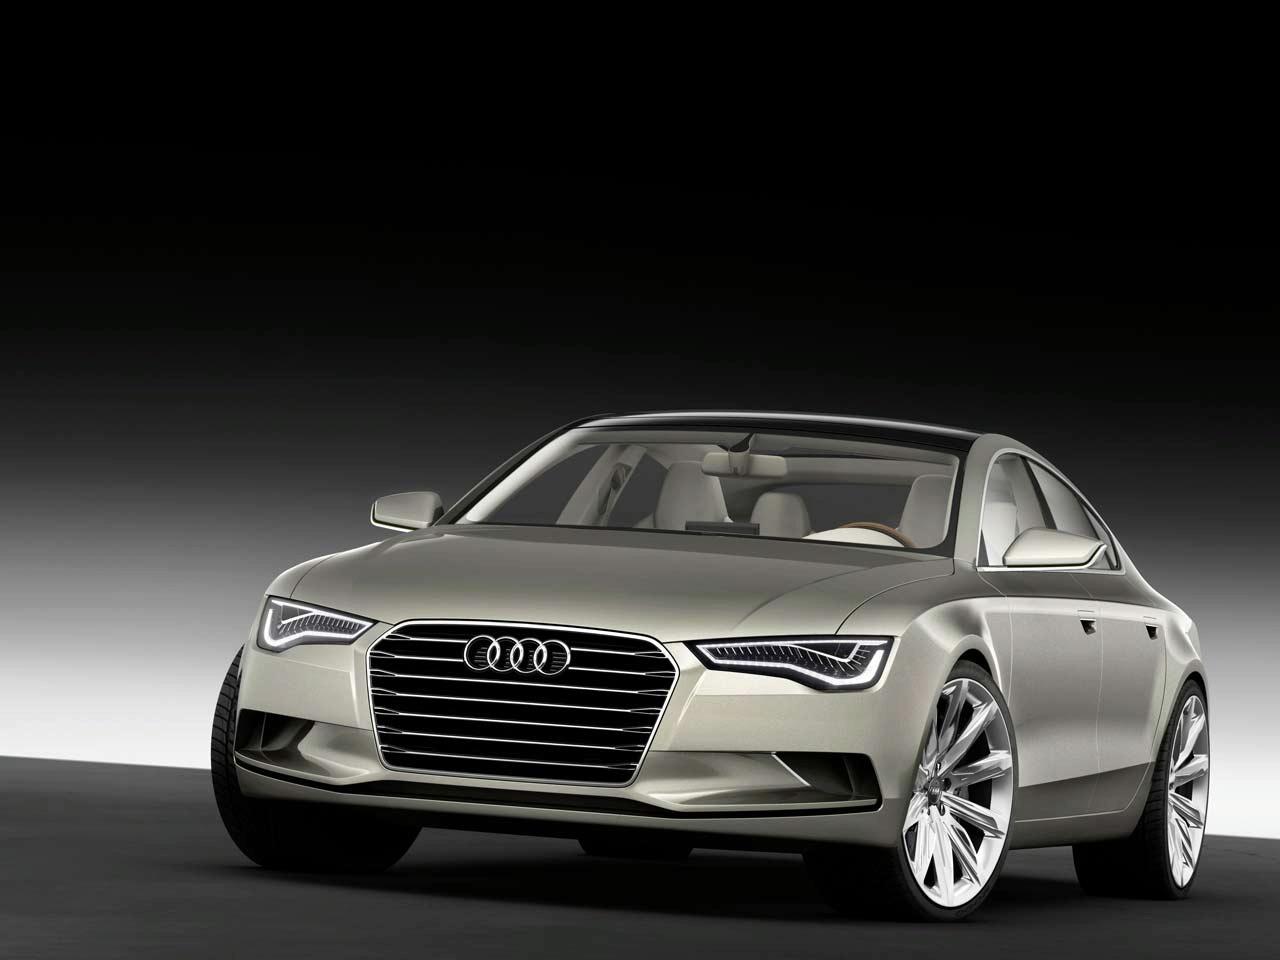 Product Latest Price Audi A Sportback Concept Price In India - Audi latest price